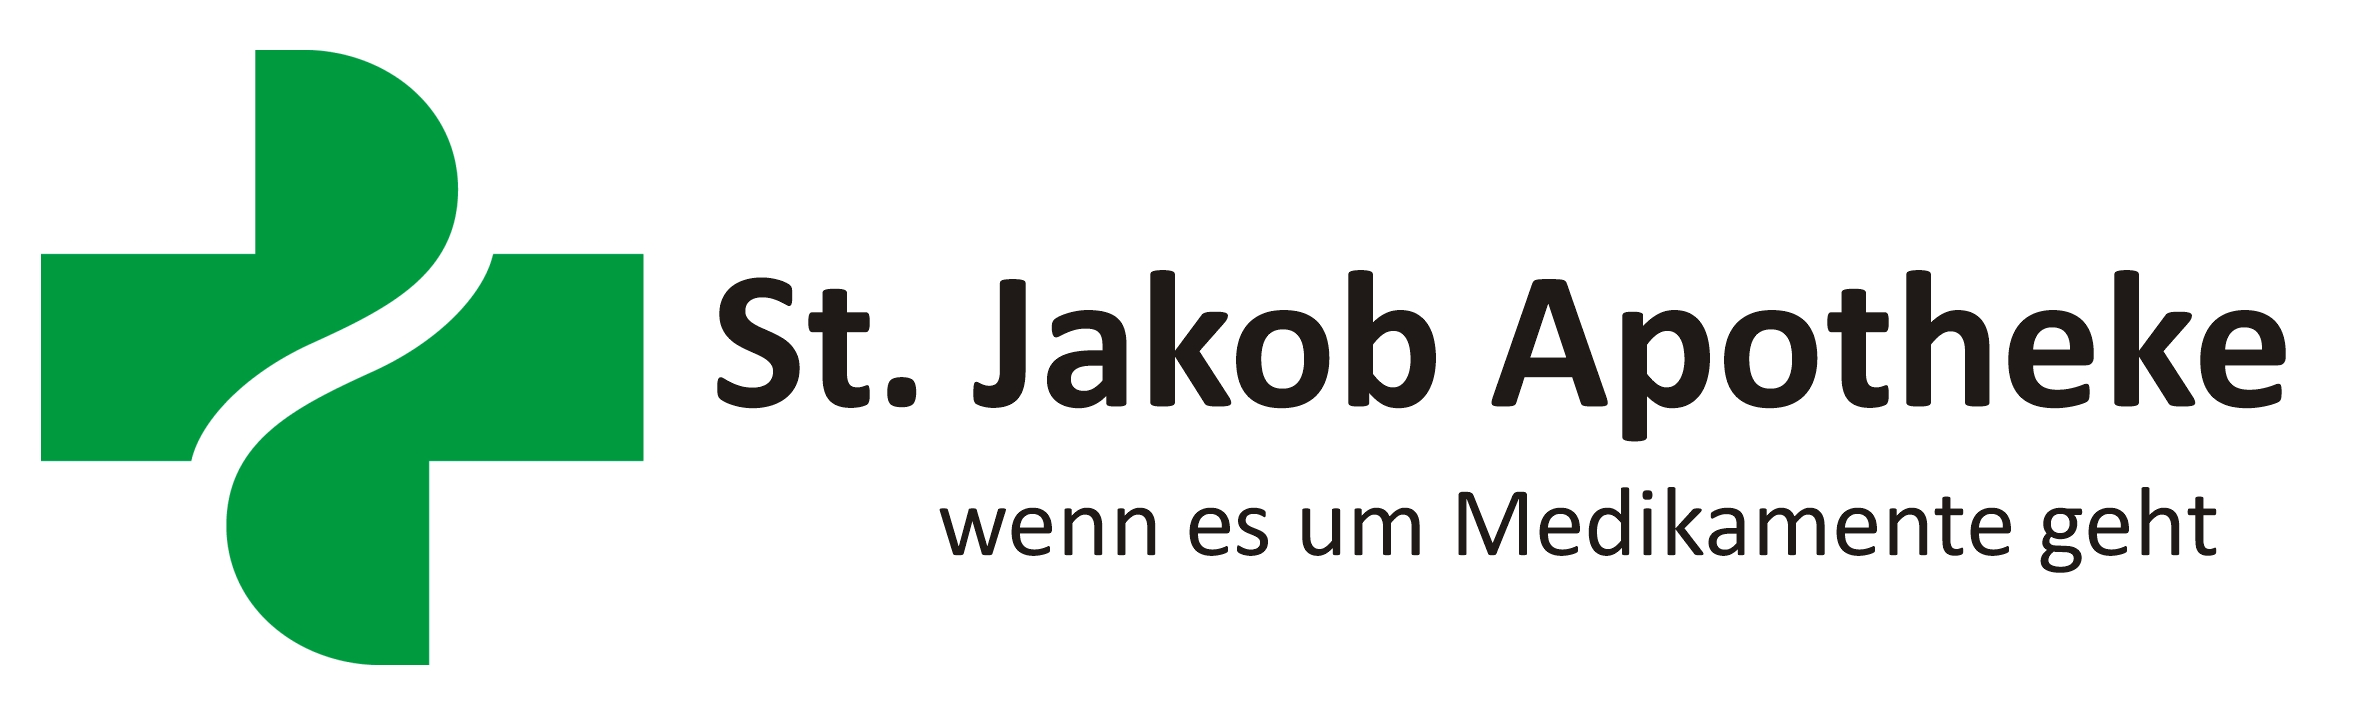 Logo St. Jakob Apotheke